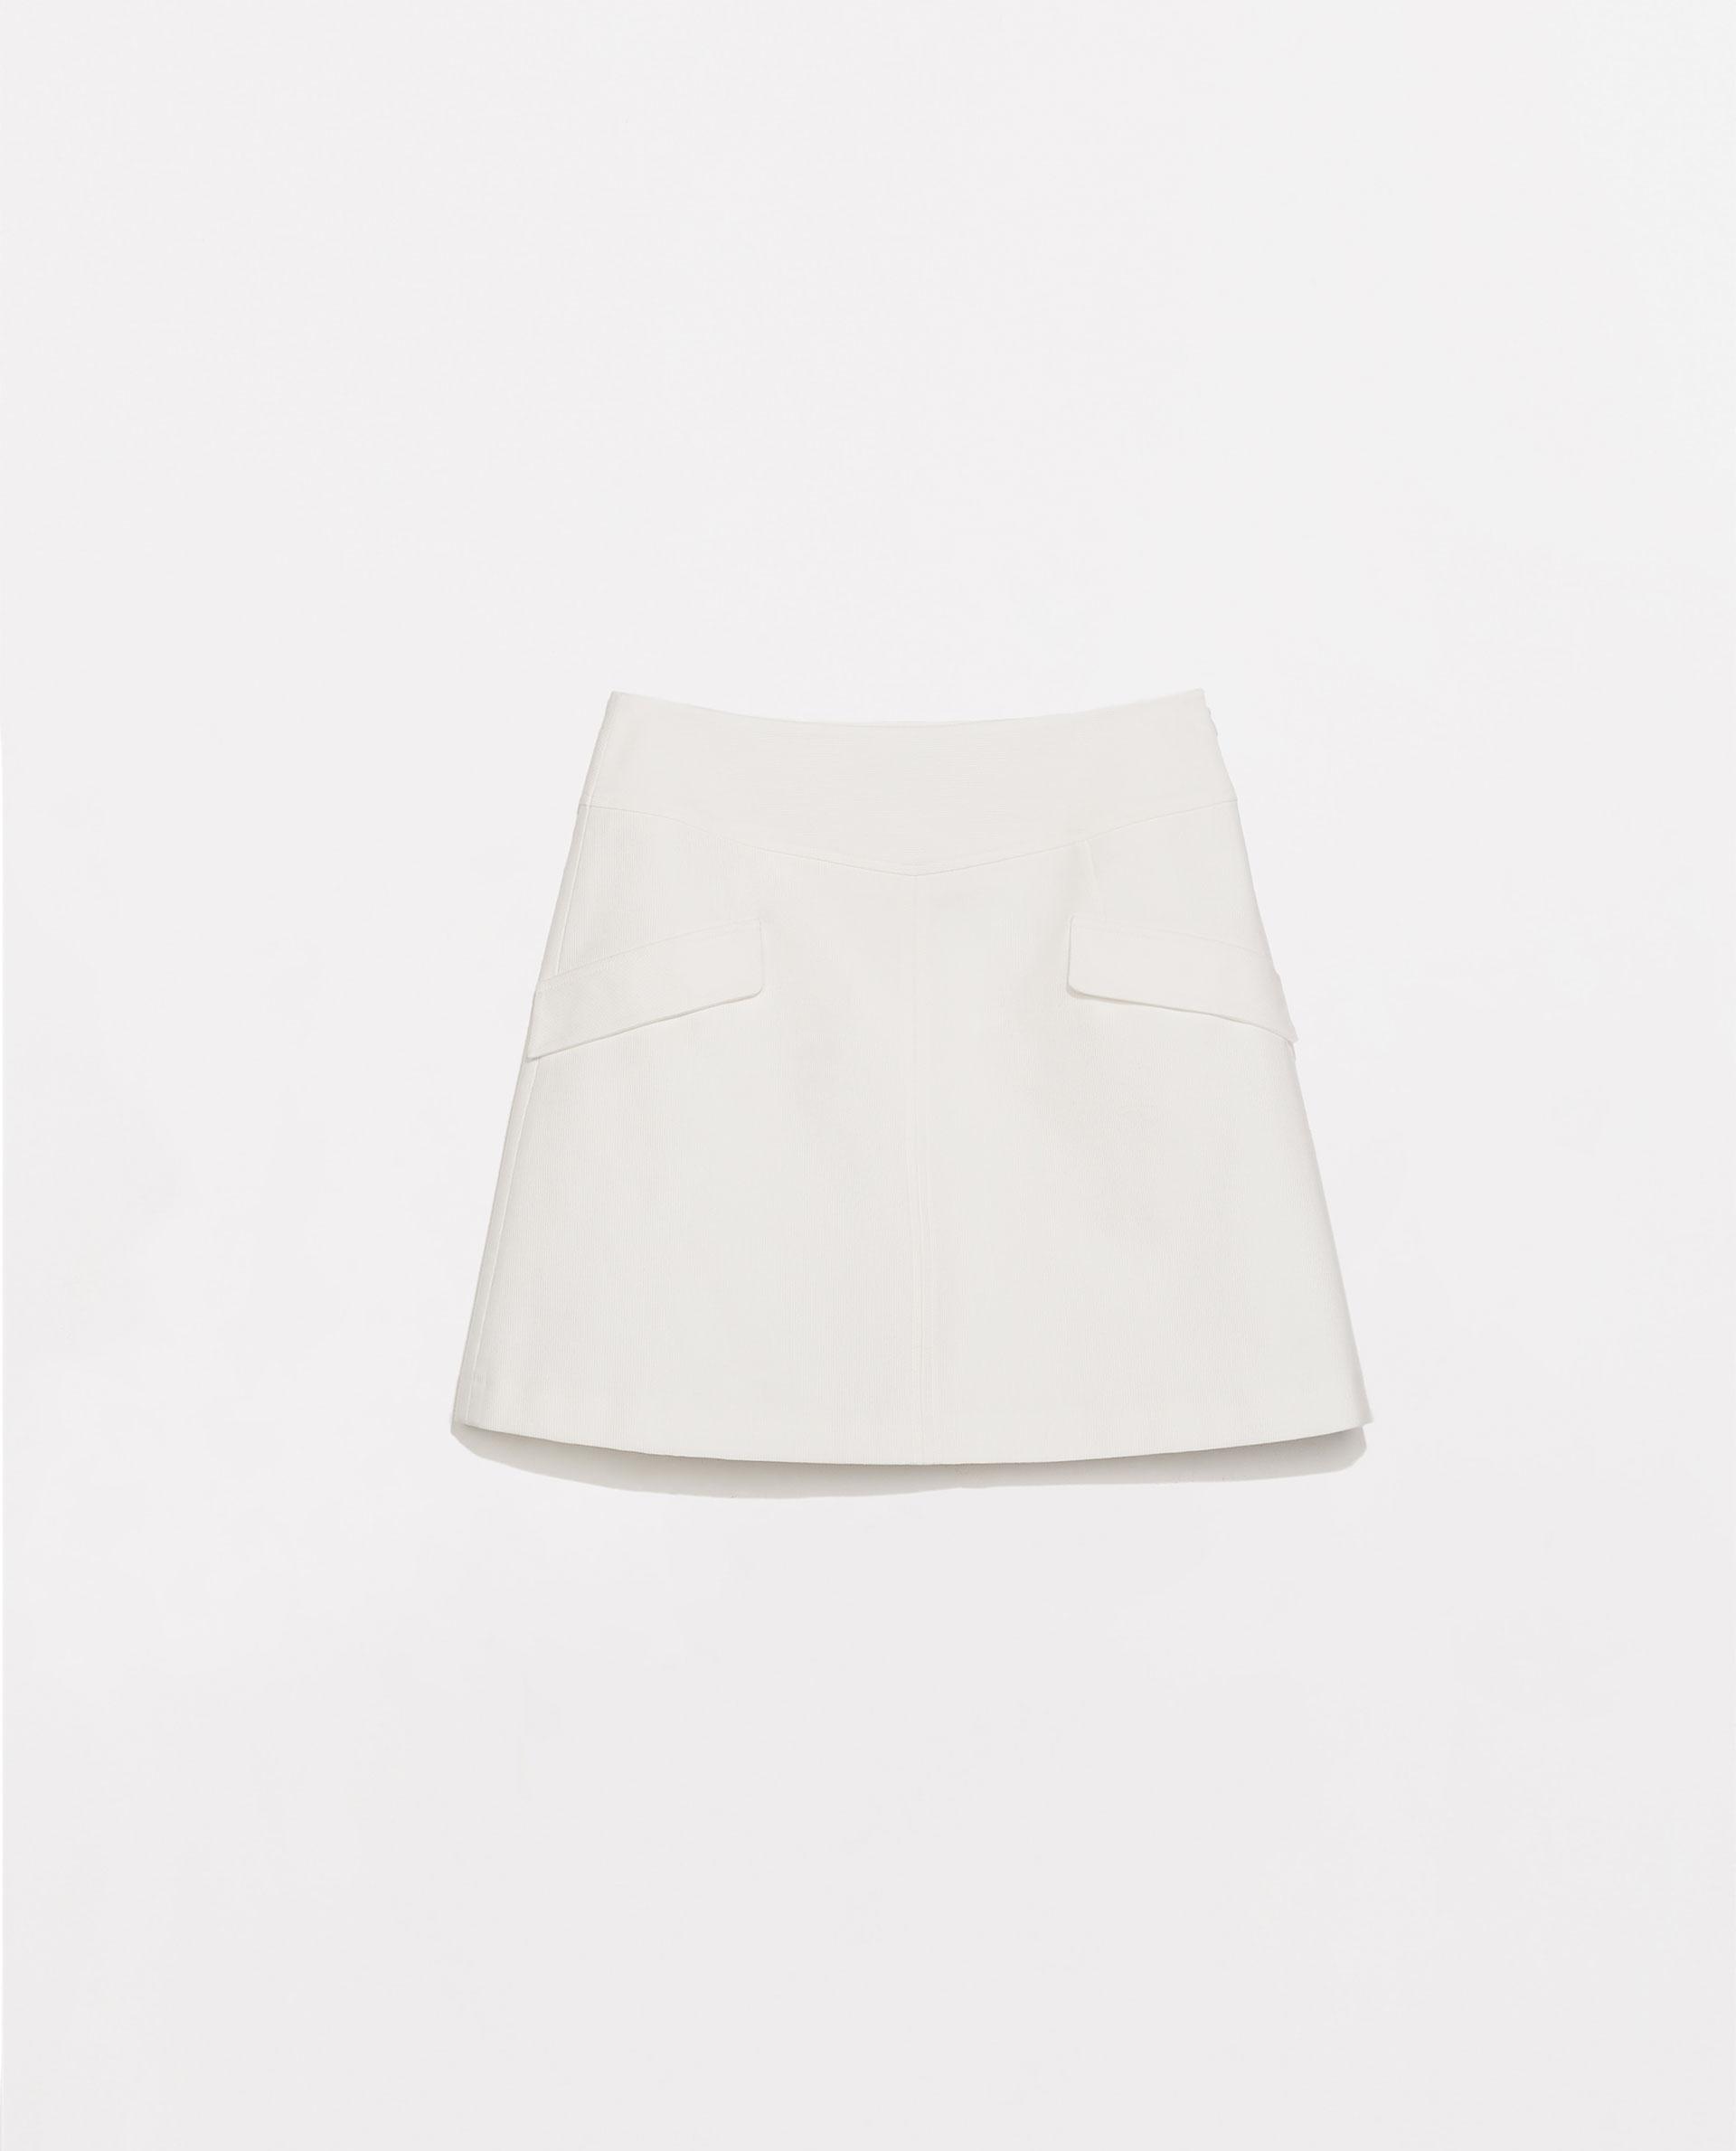 Zara A-Line Skirt in White | Lyst